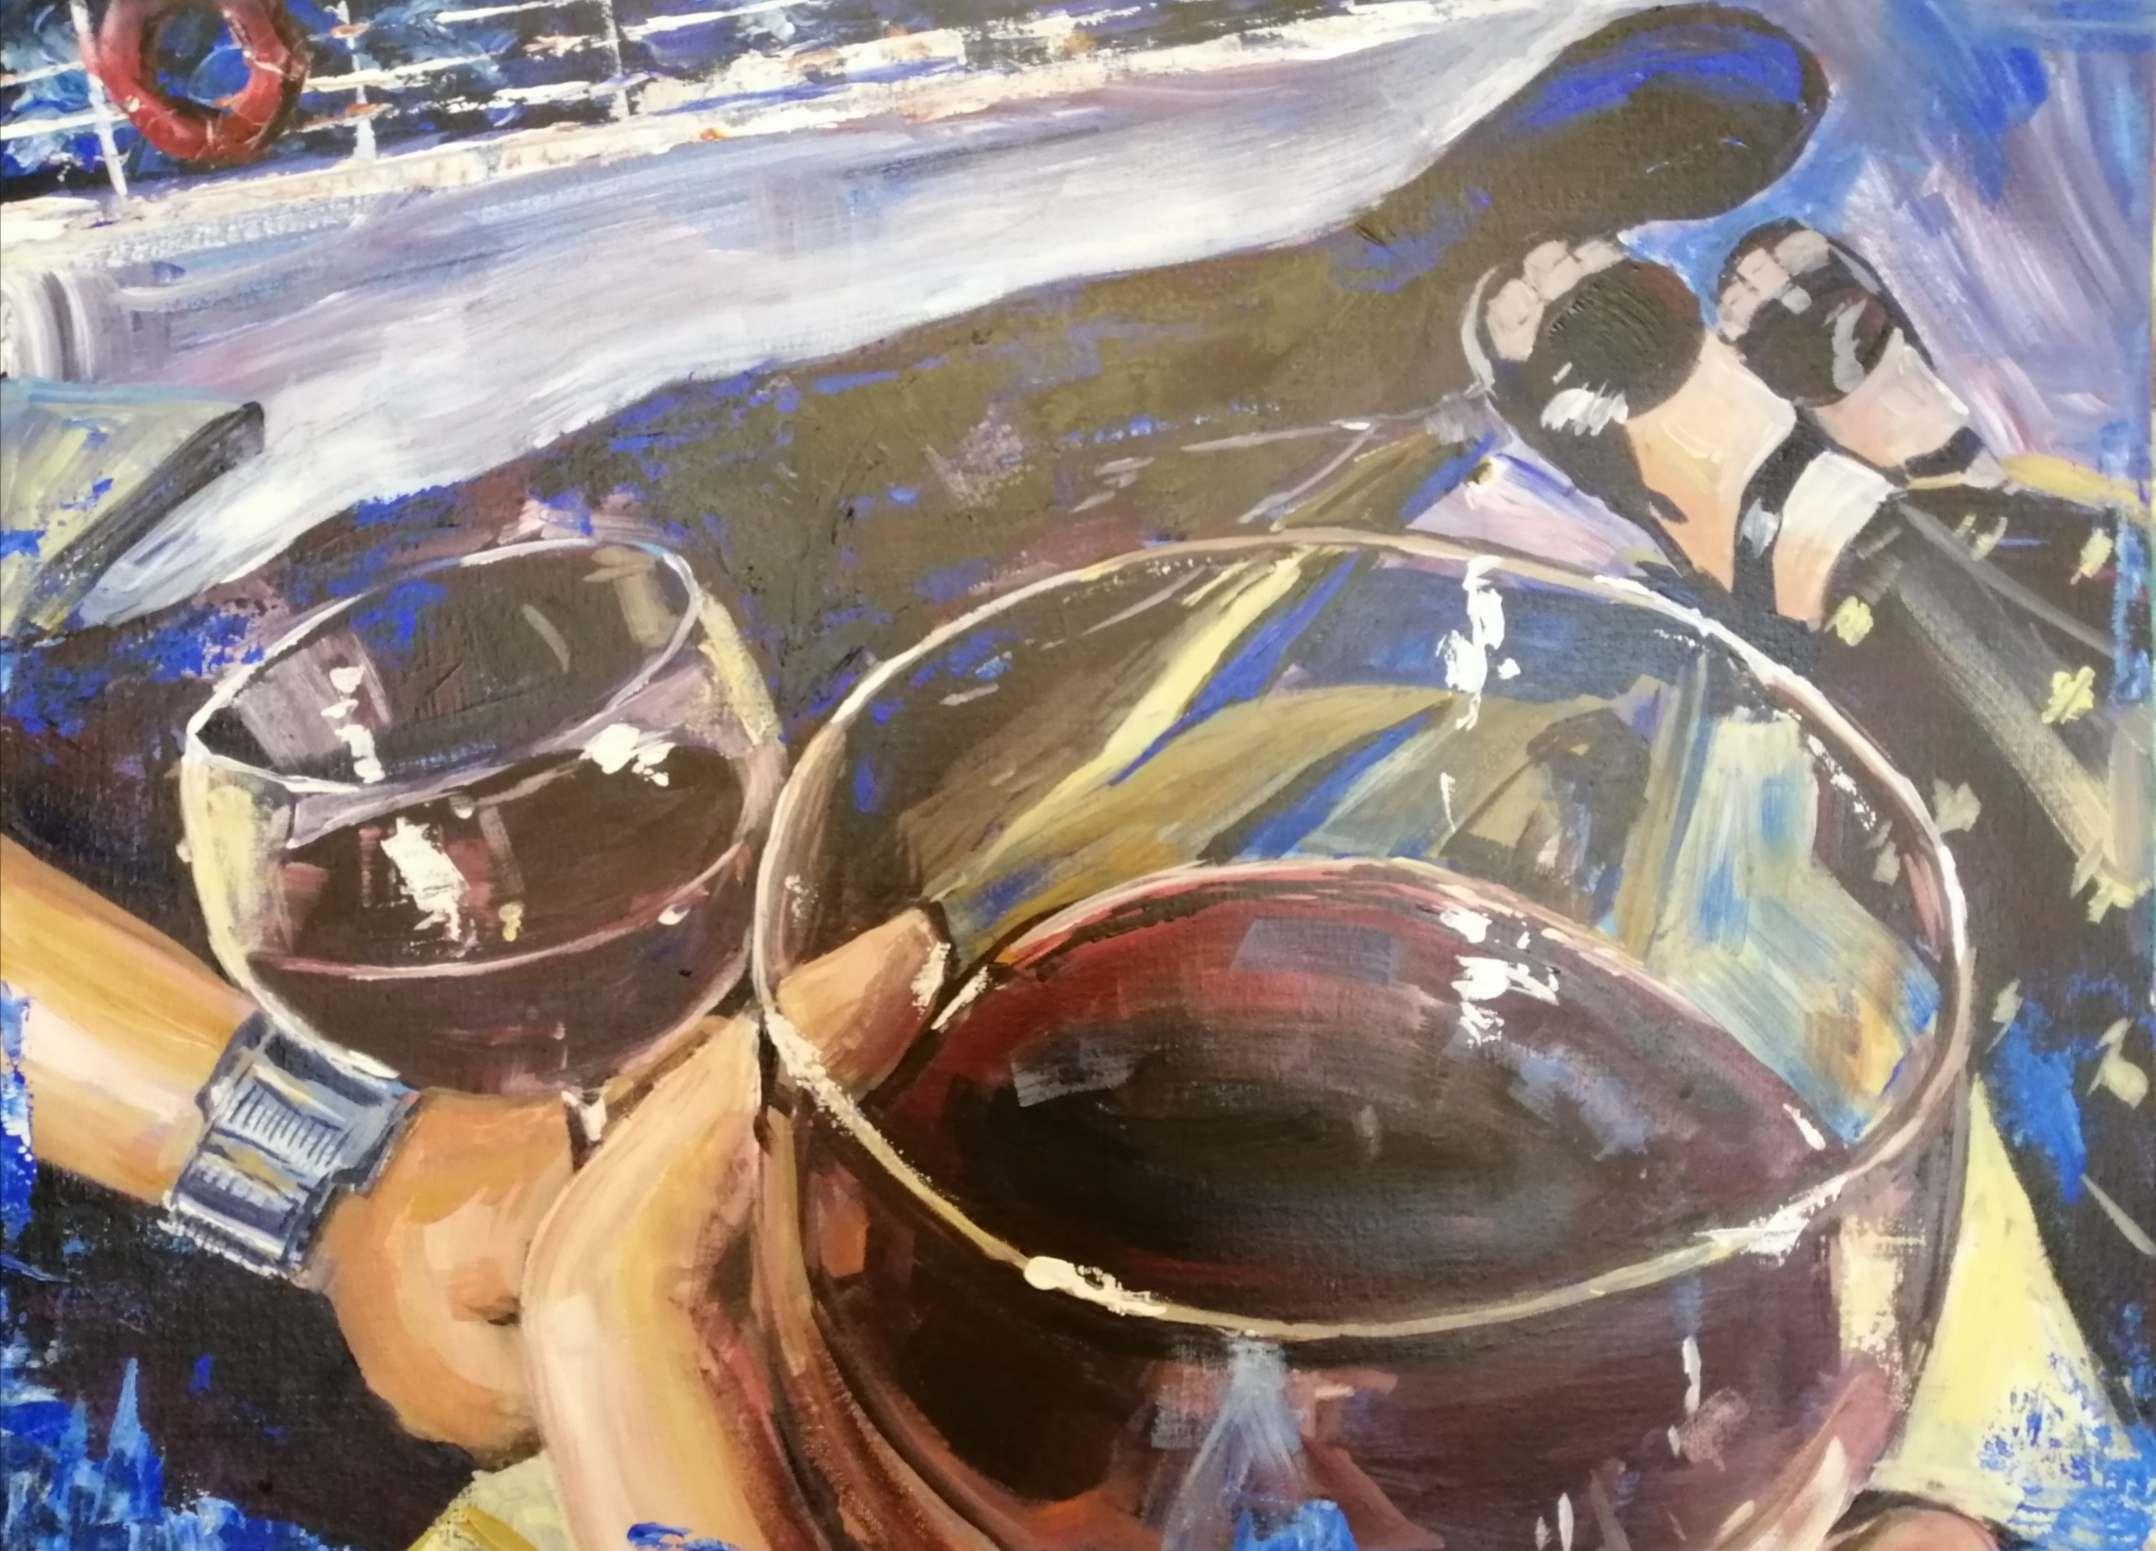 Mulled wine & hot chocolate, ORIGINAL art sale. Marilyn Allis